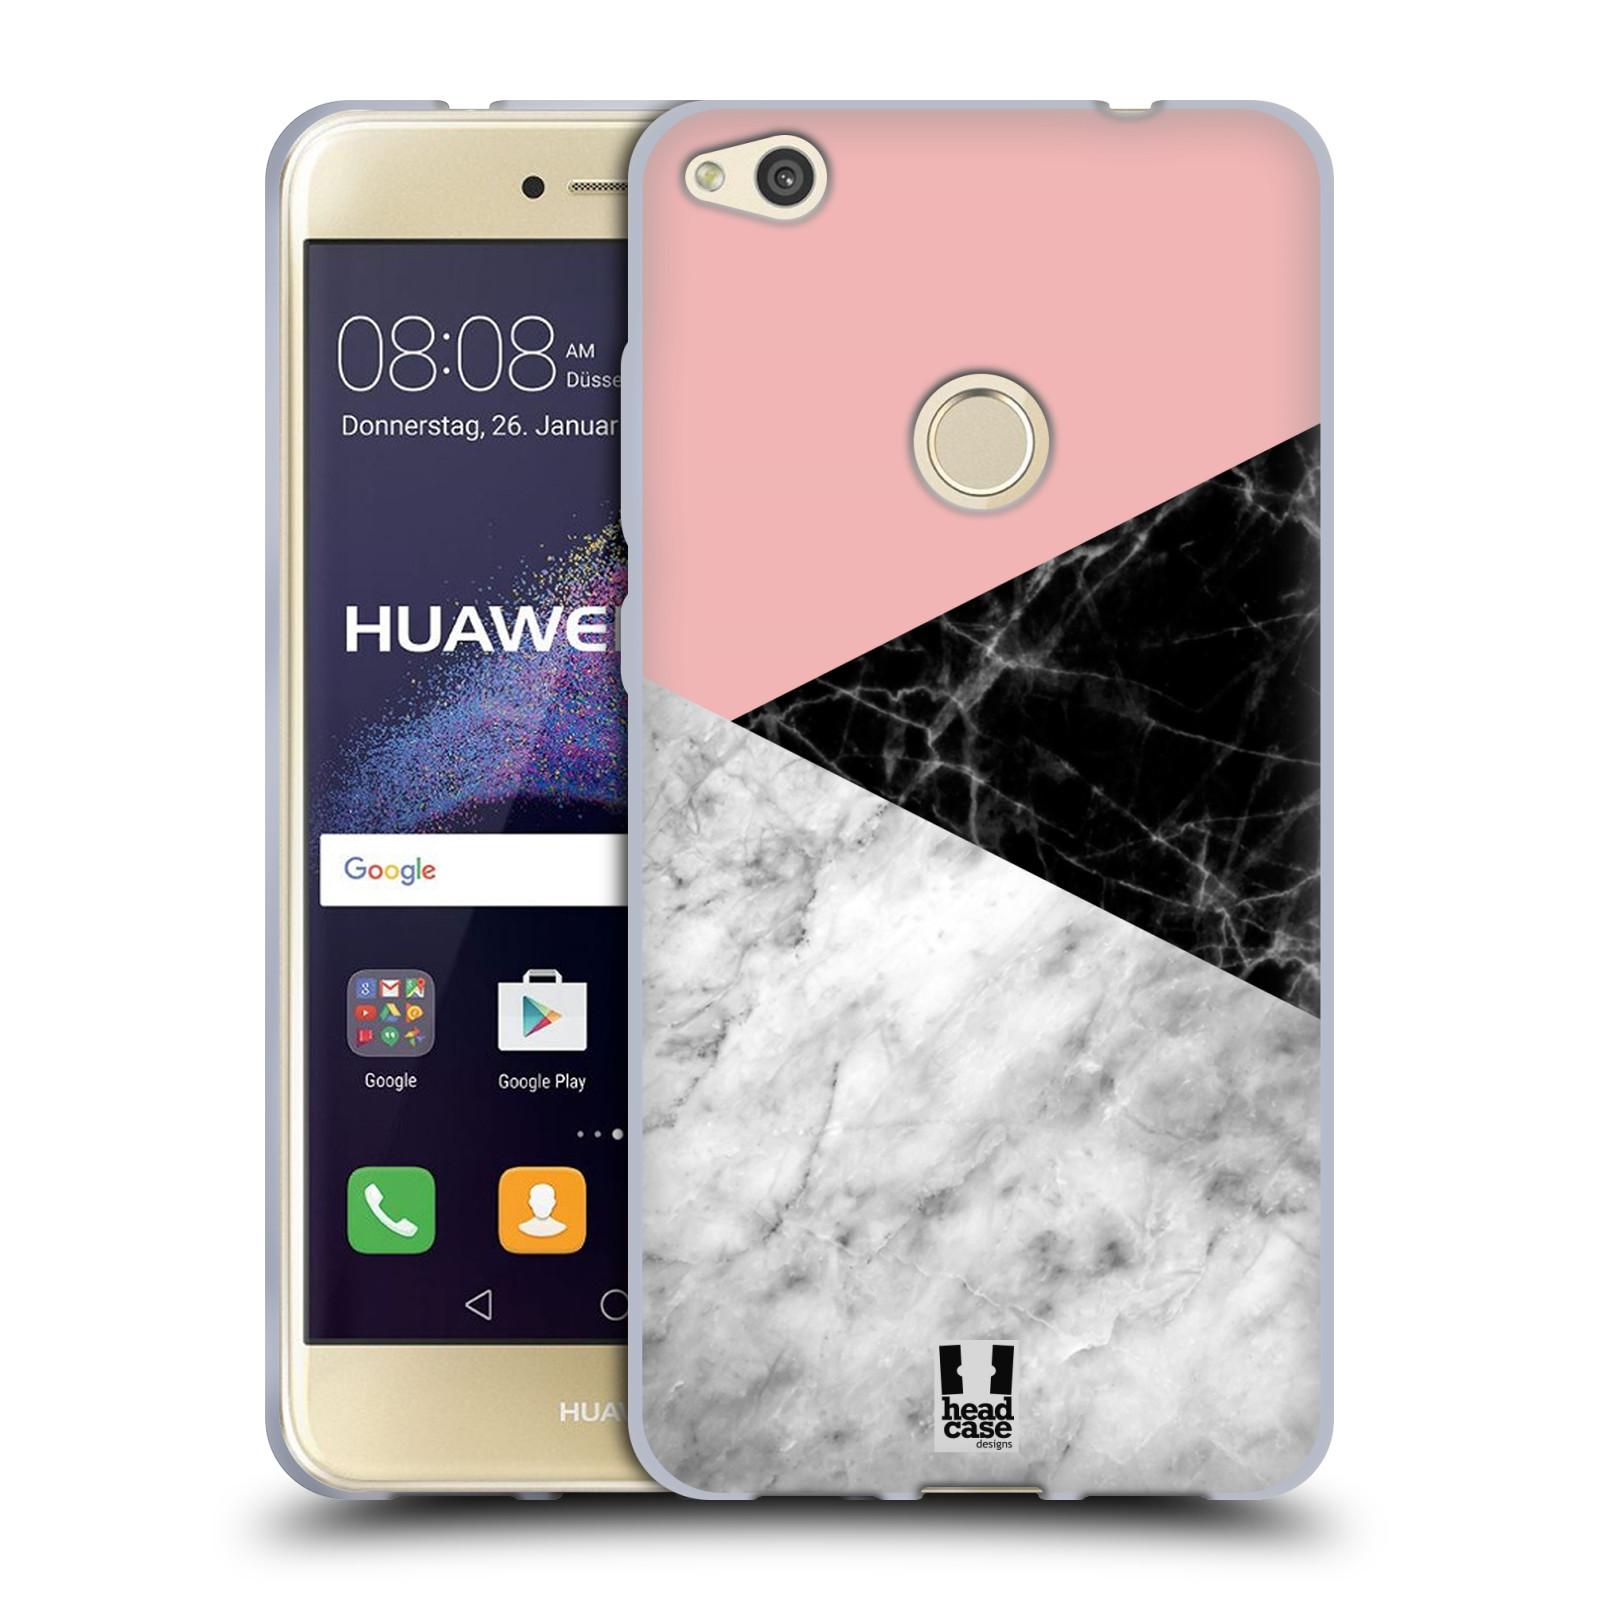 Silikonové pouzdro na mobil Huawei P9 Lite (2017) - Head Case - Mramor mix